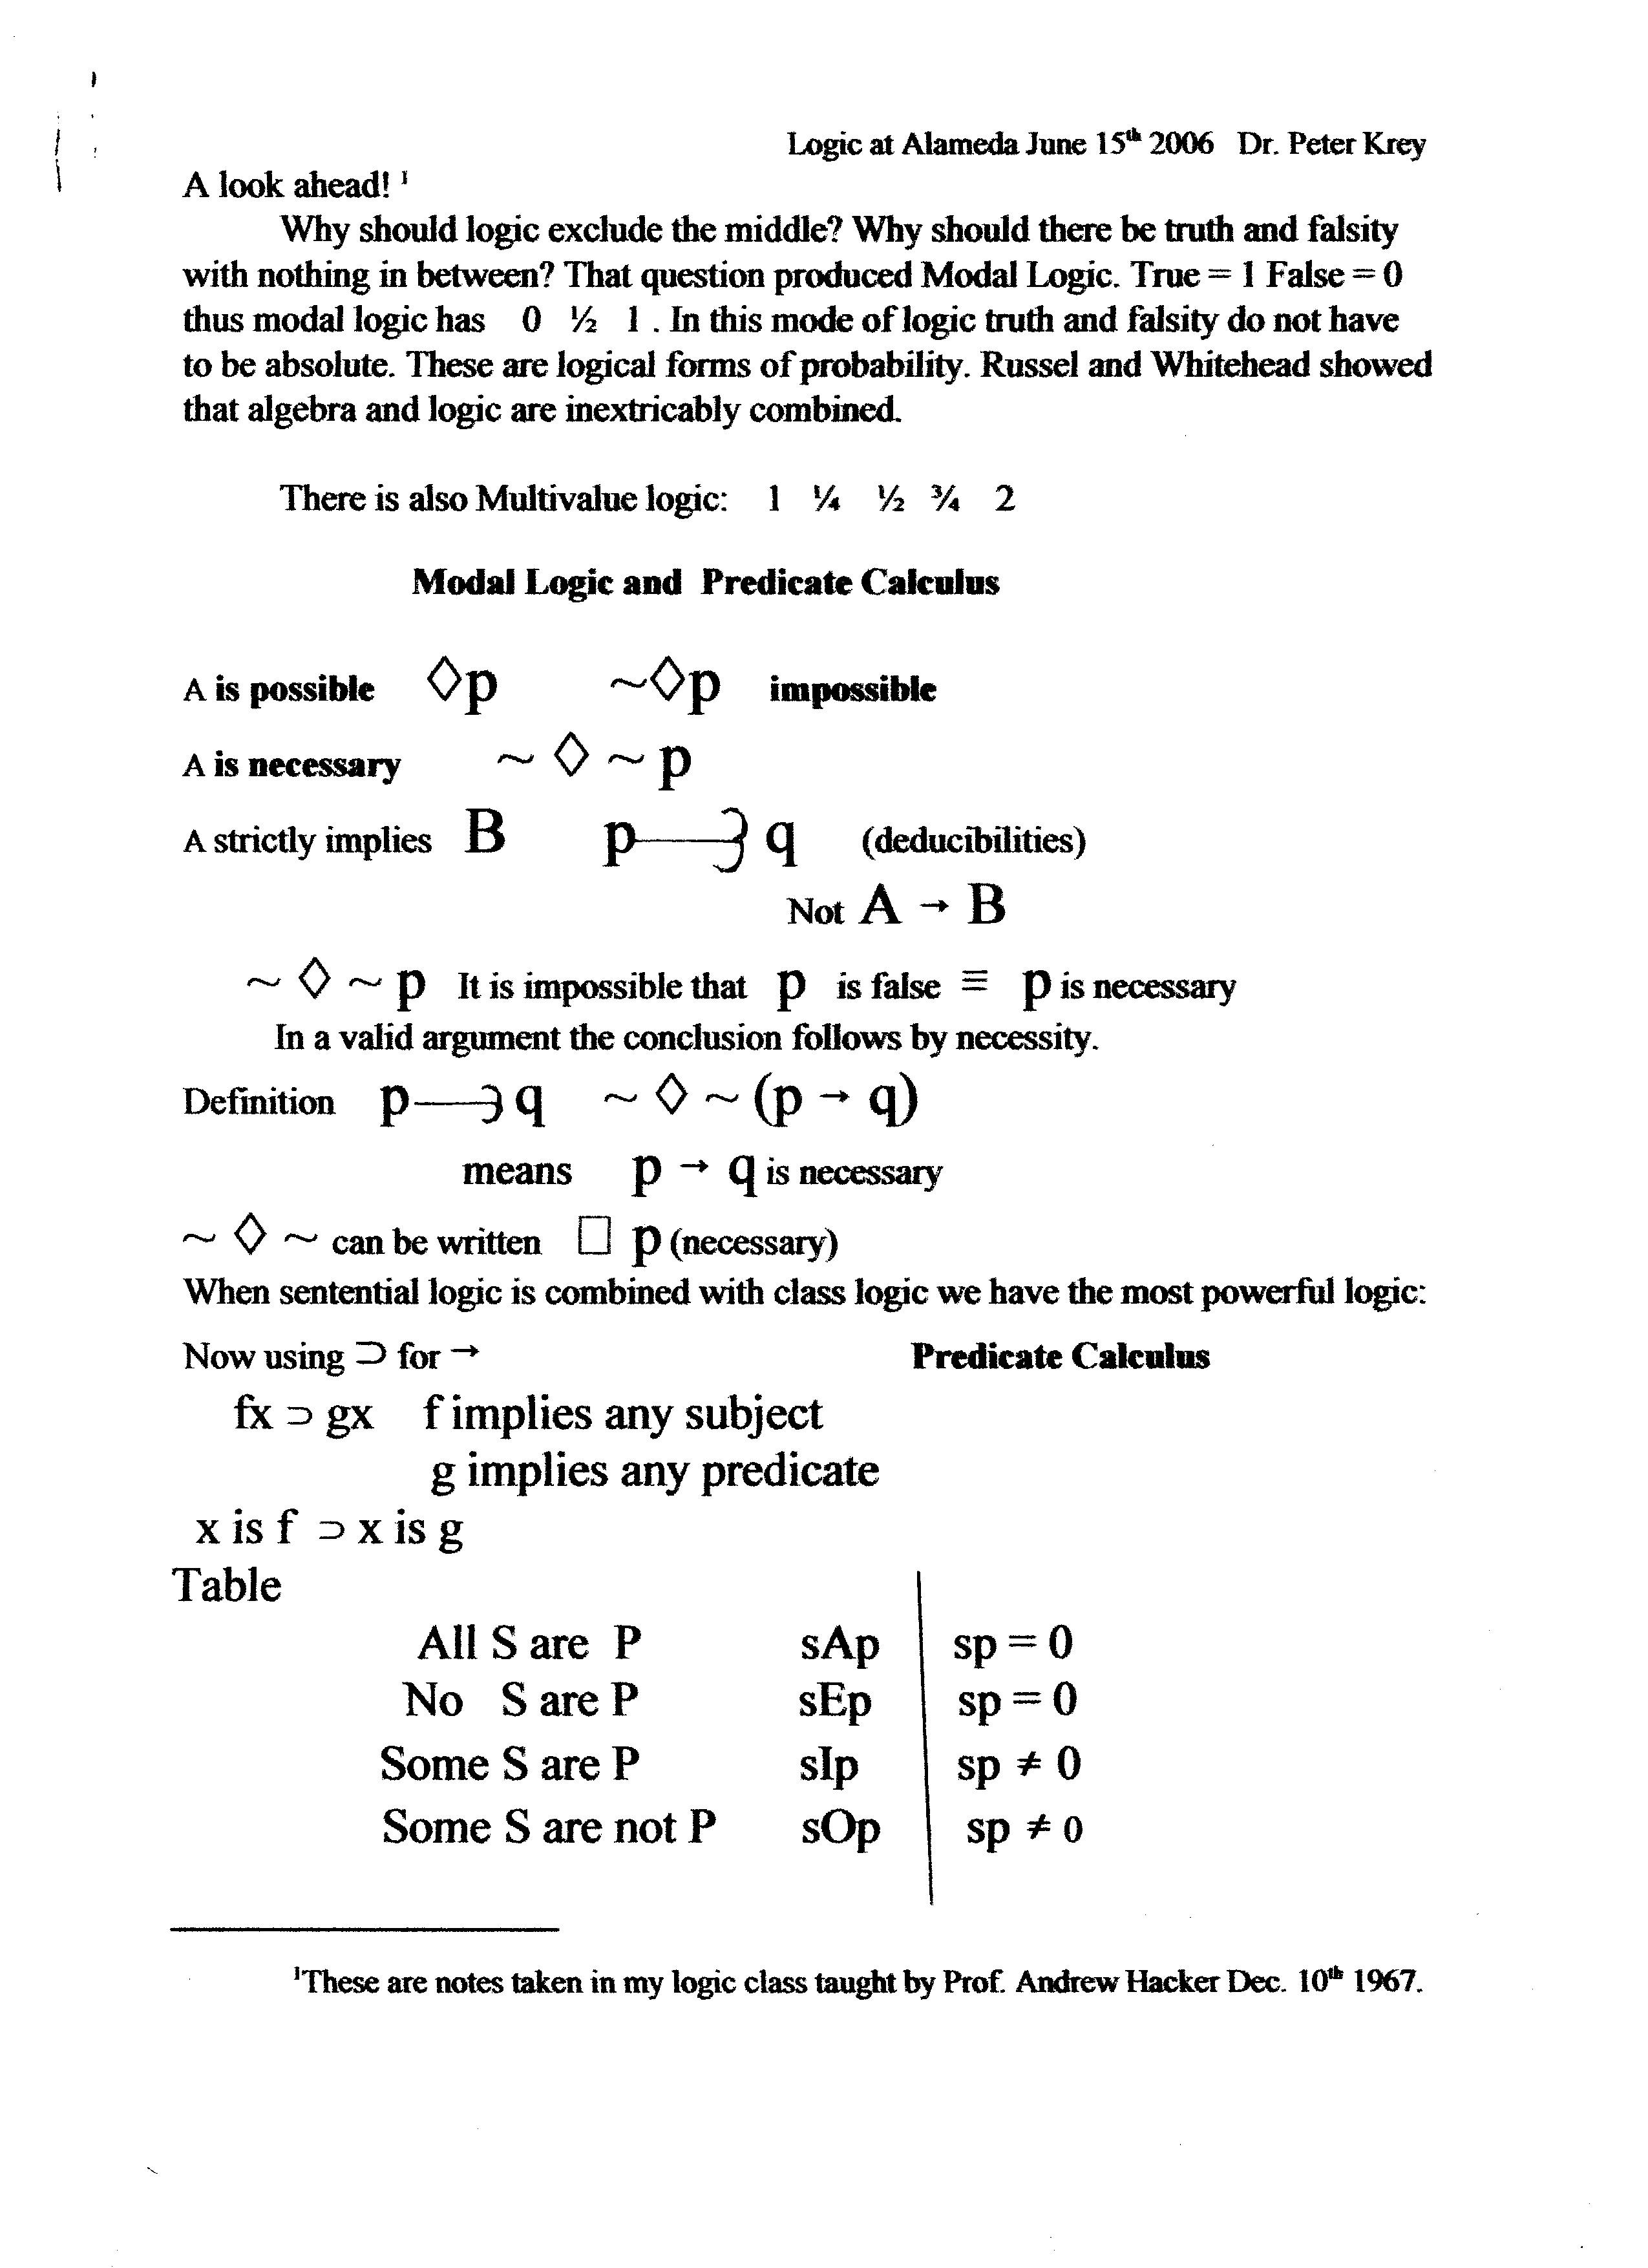 Modal Logic And Predicate Calculus